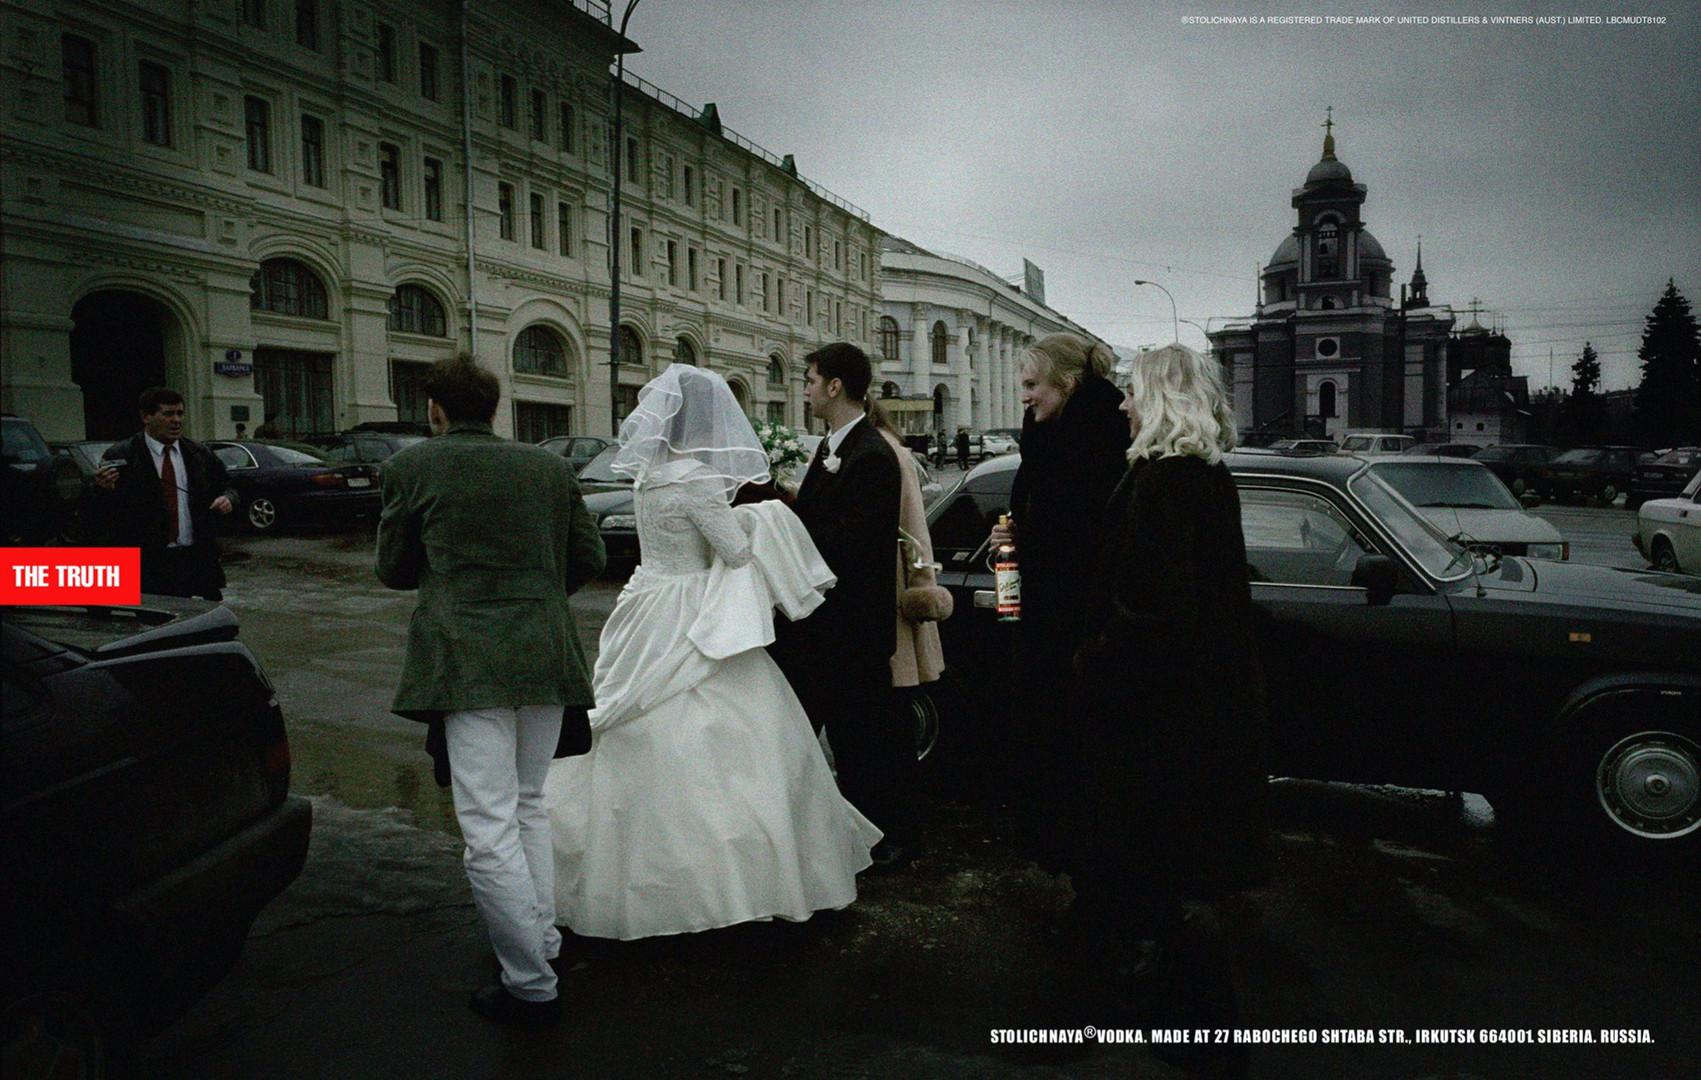 Stoli-wedding_edited.jpg